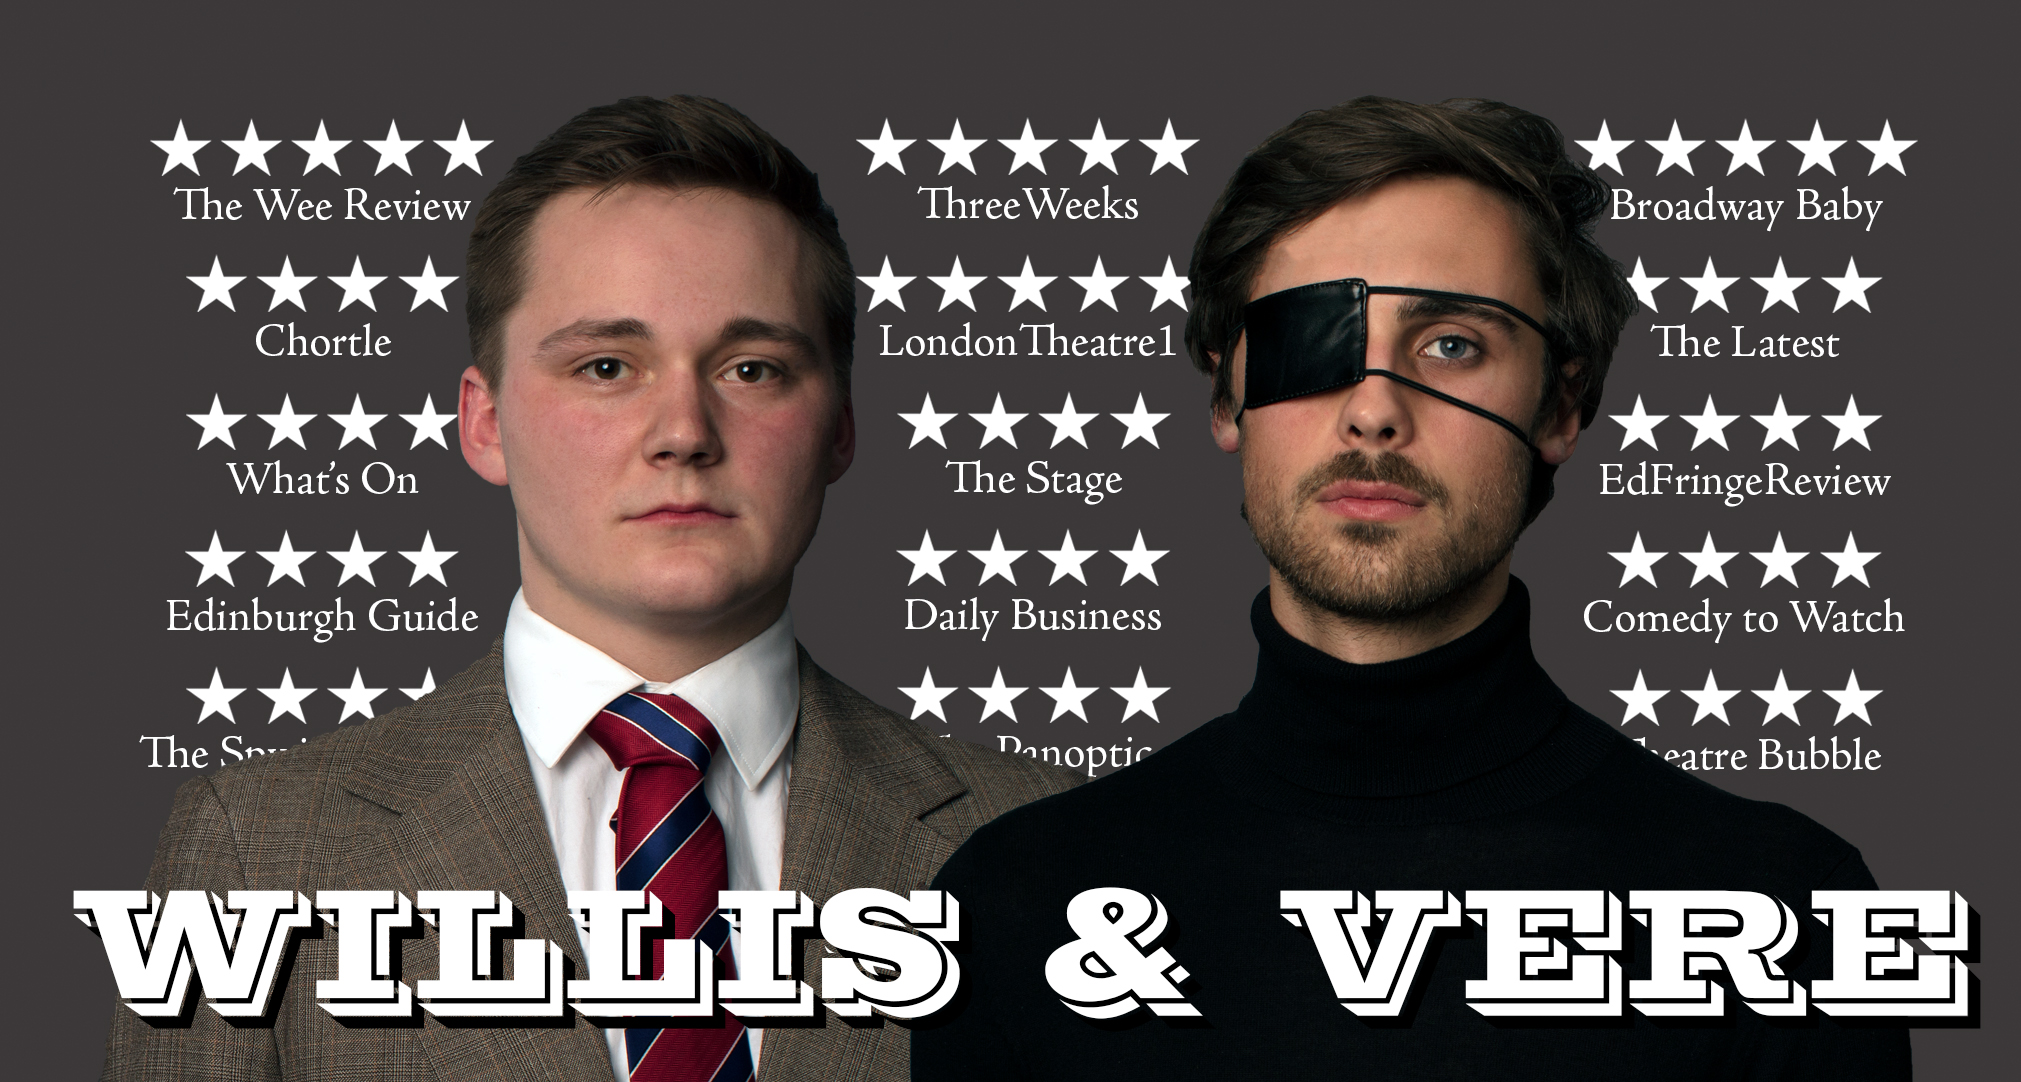 Willis & Vere